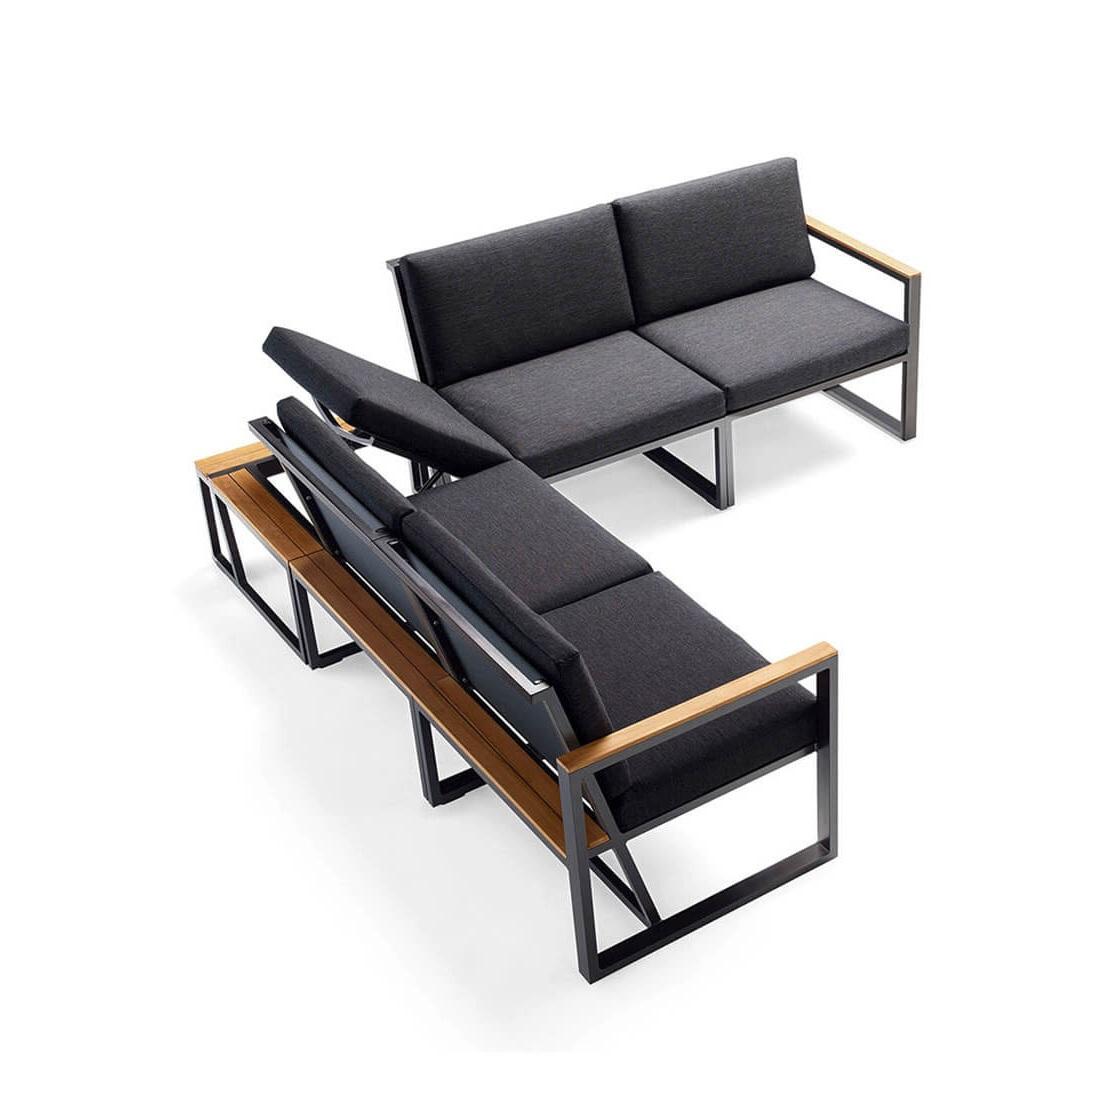 Градински ъглов диван I, колекция Havanna